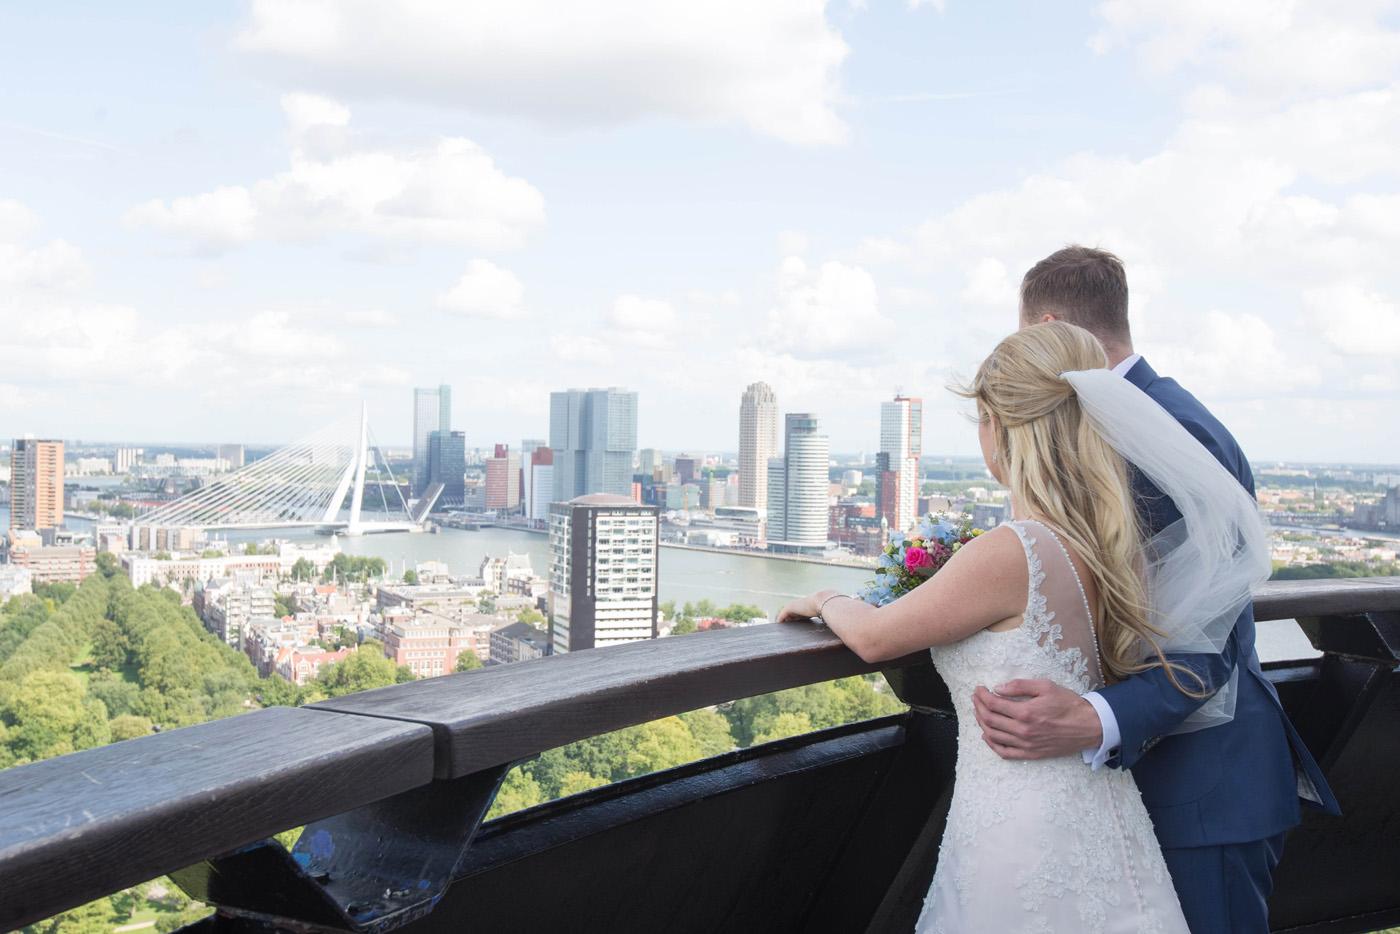 verrassing voor bruidegom